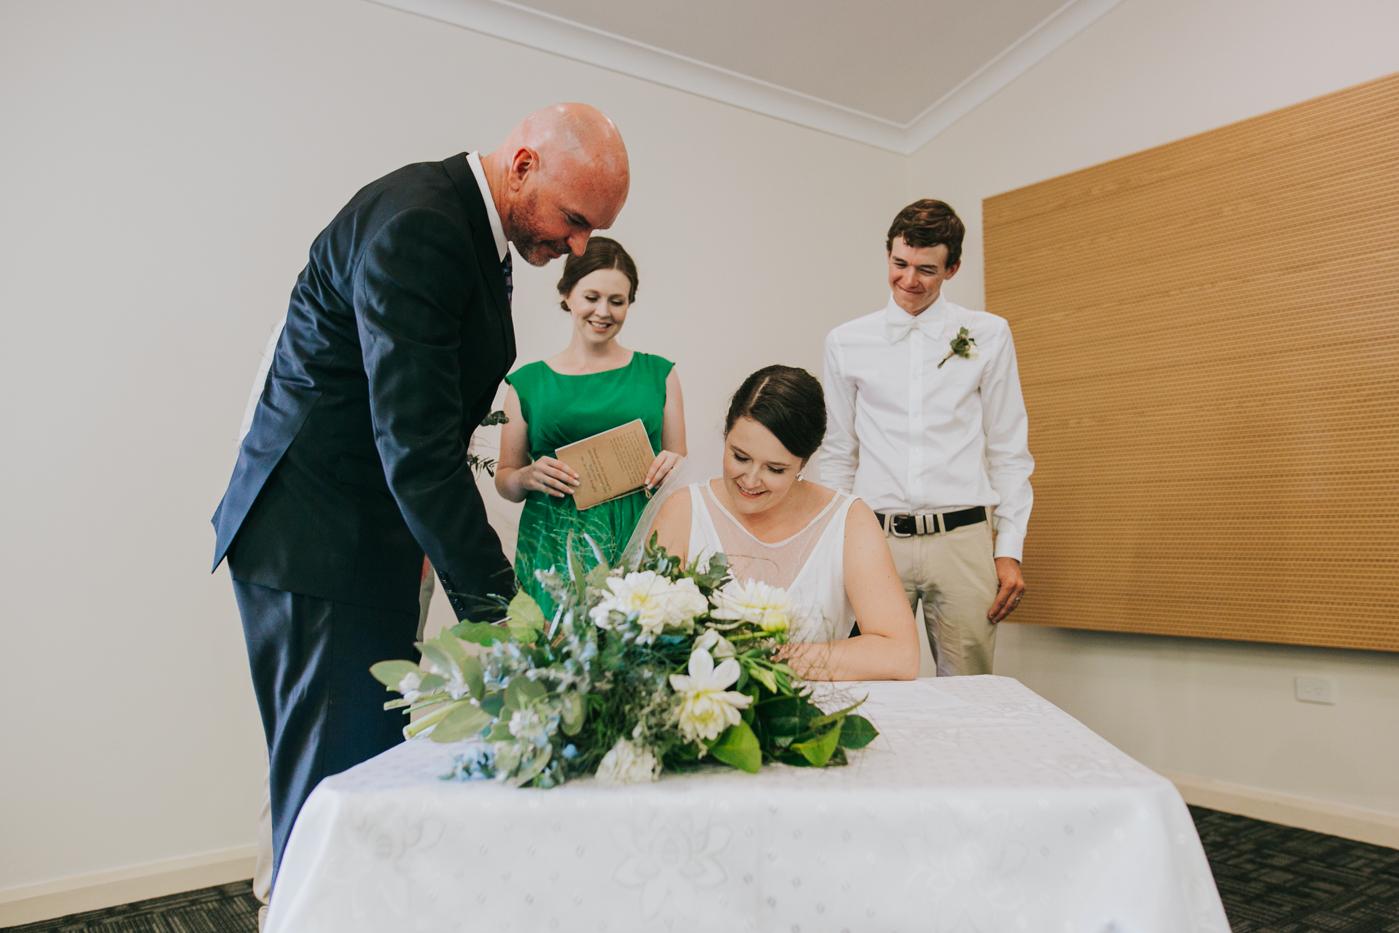 Nicolle & Jacob - Dubbo Wedding - Country Australia - Samantha Heather Photography-115.jpg